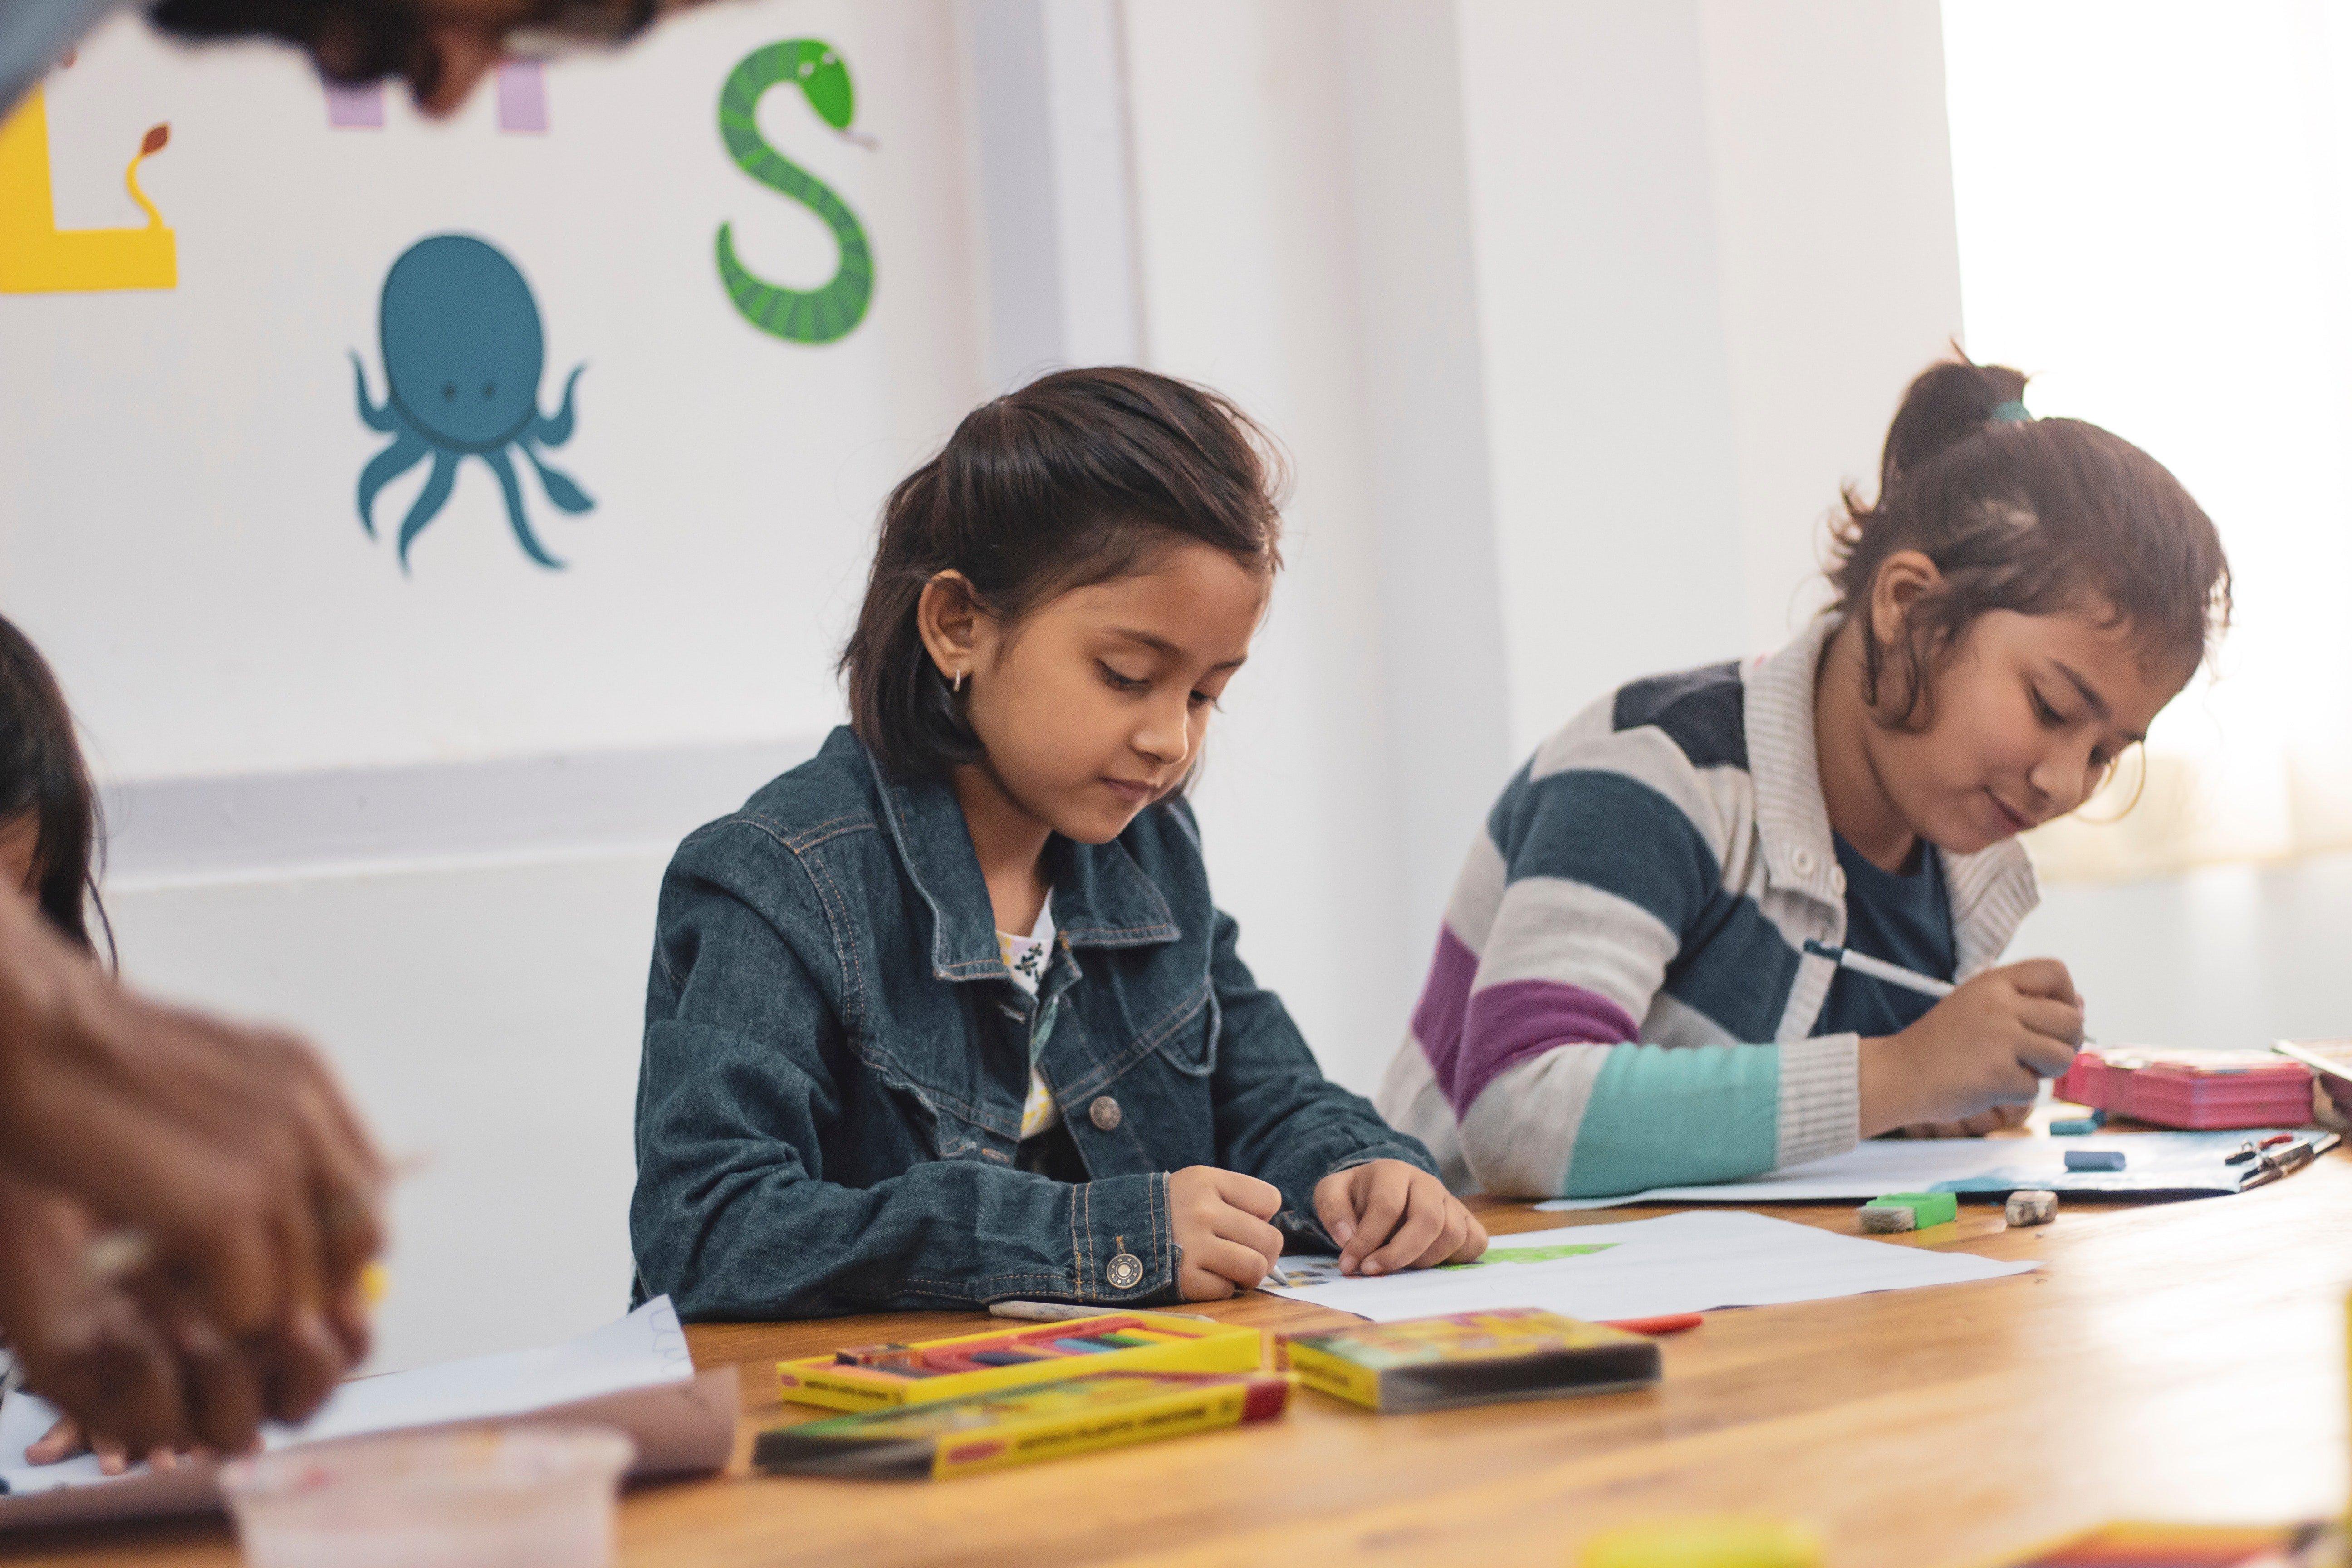 Children drawing. | Source: Pexels